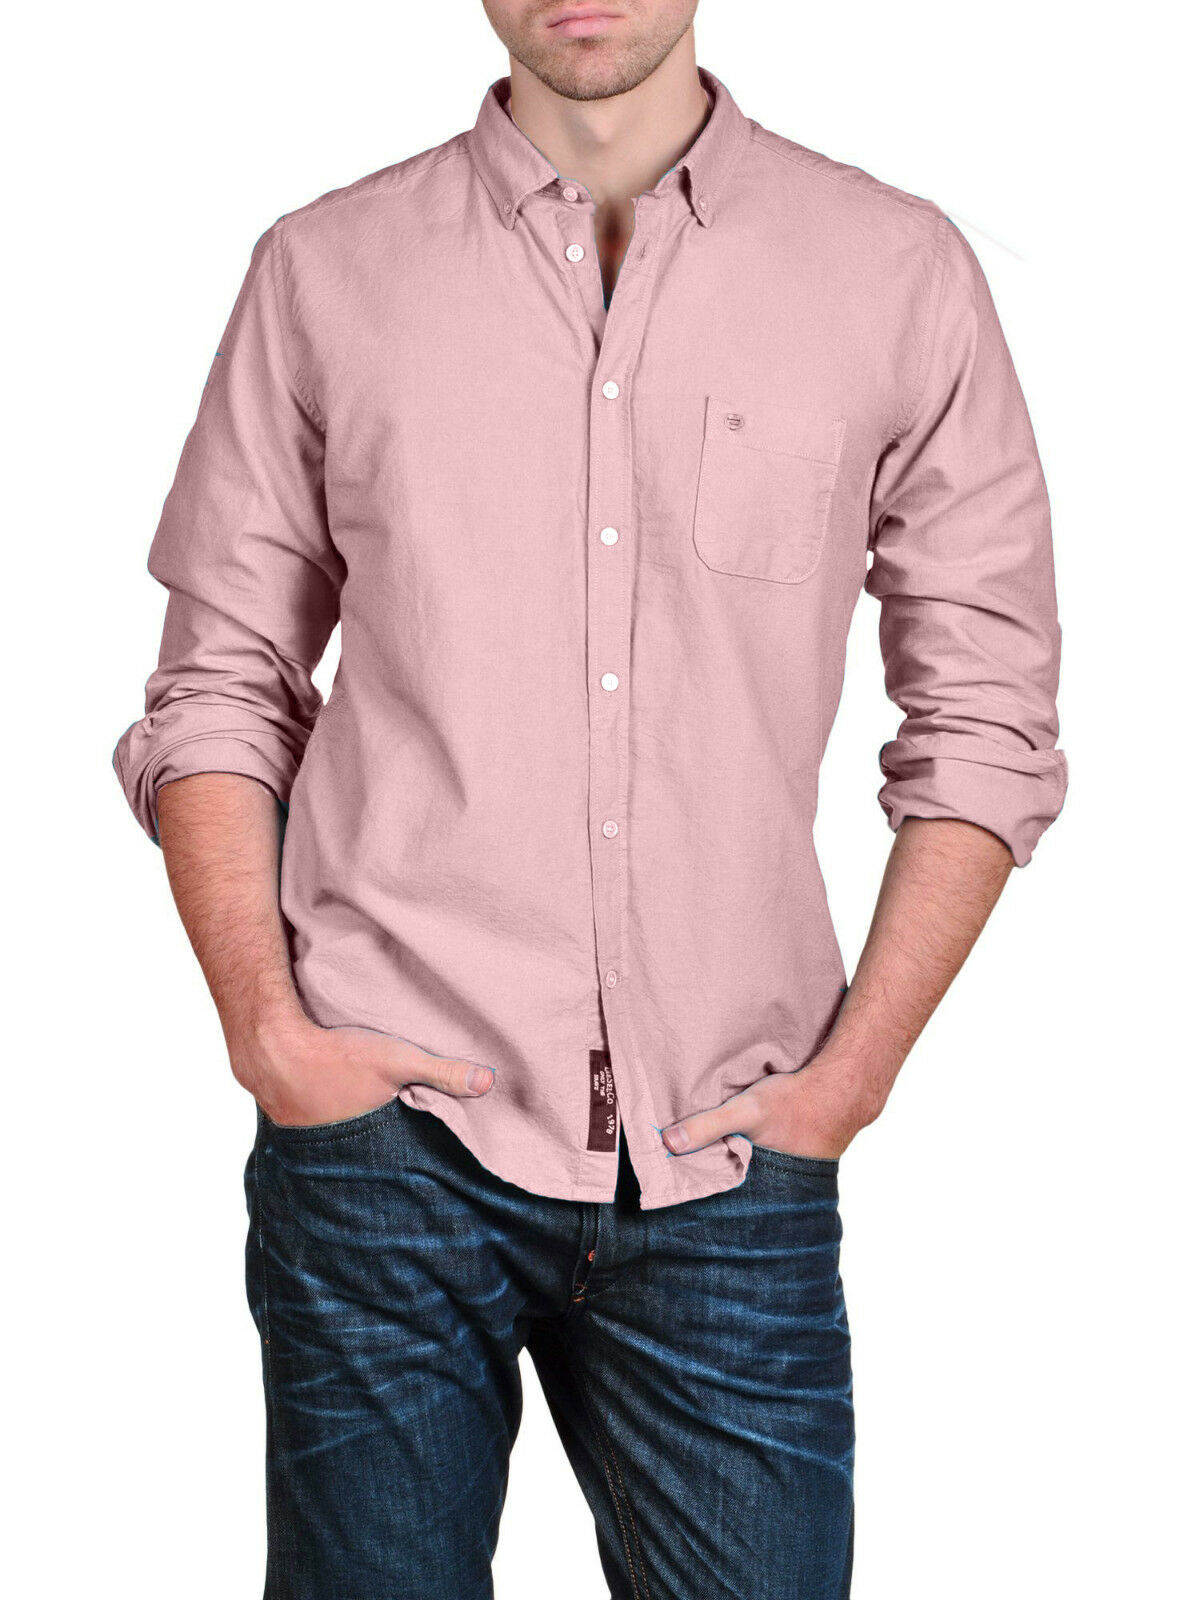 Authentic rare DIESEL Men's Shank-R Light Pink Dress Casual Shirt M